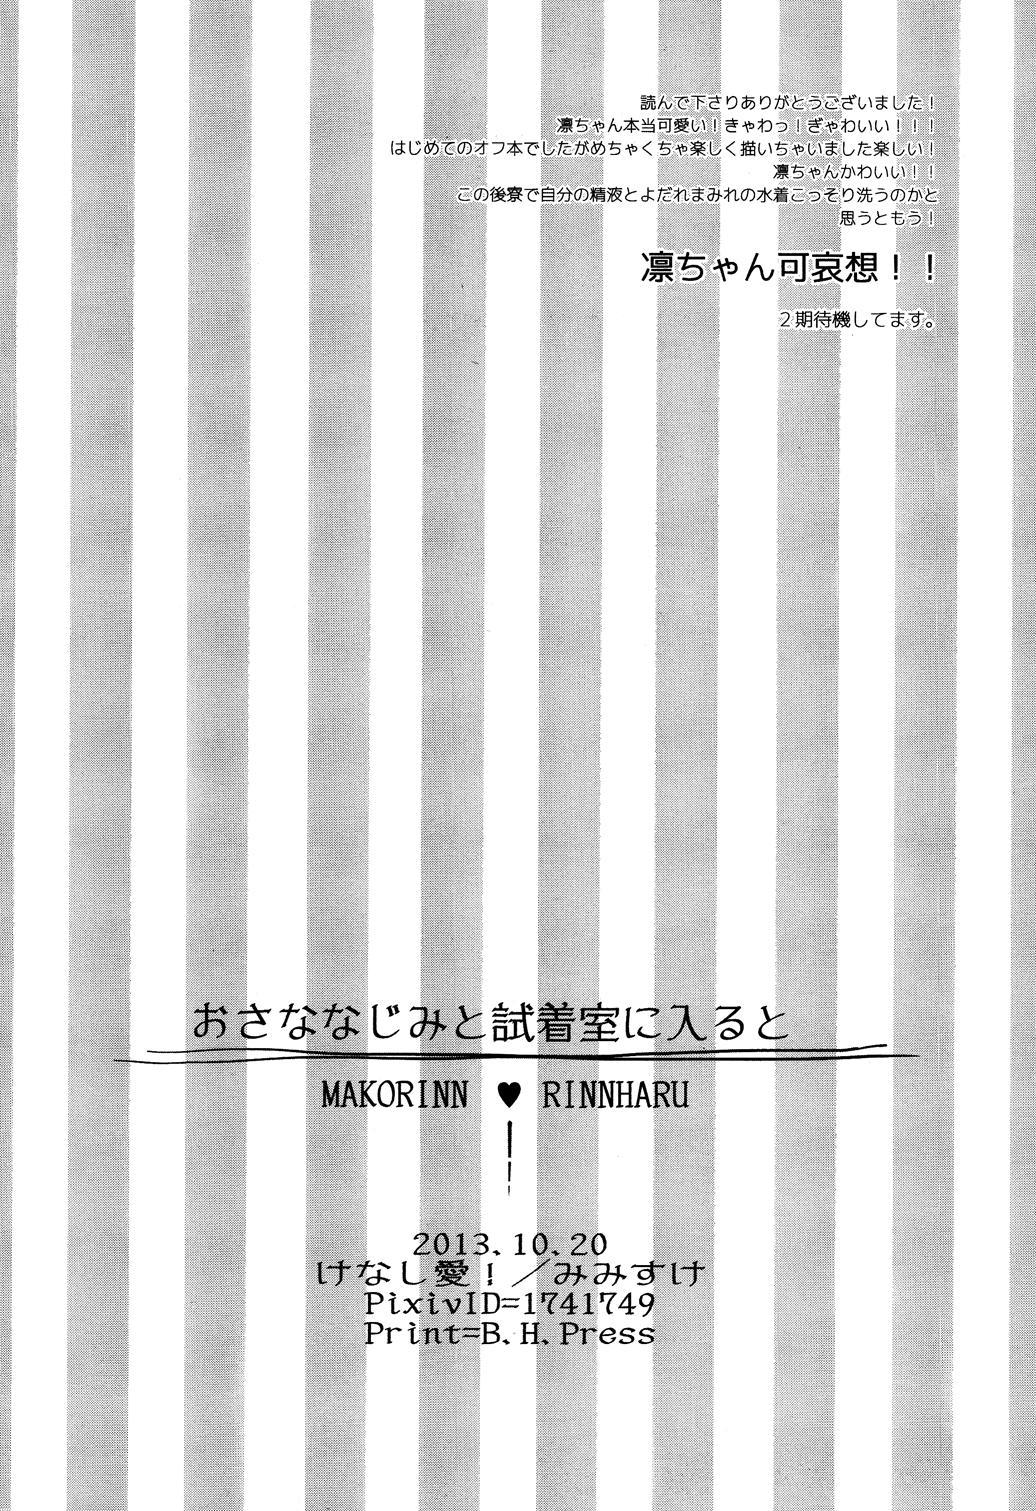 Osananajimi to Shichakushitsu ni Hairu to | When I Get Into The Dressing Room With My Childhood Friends 24